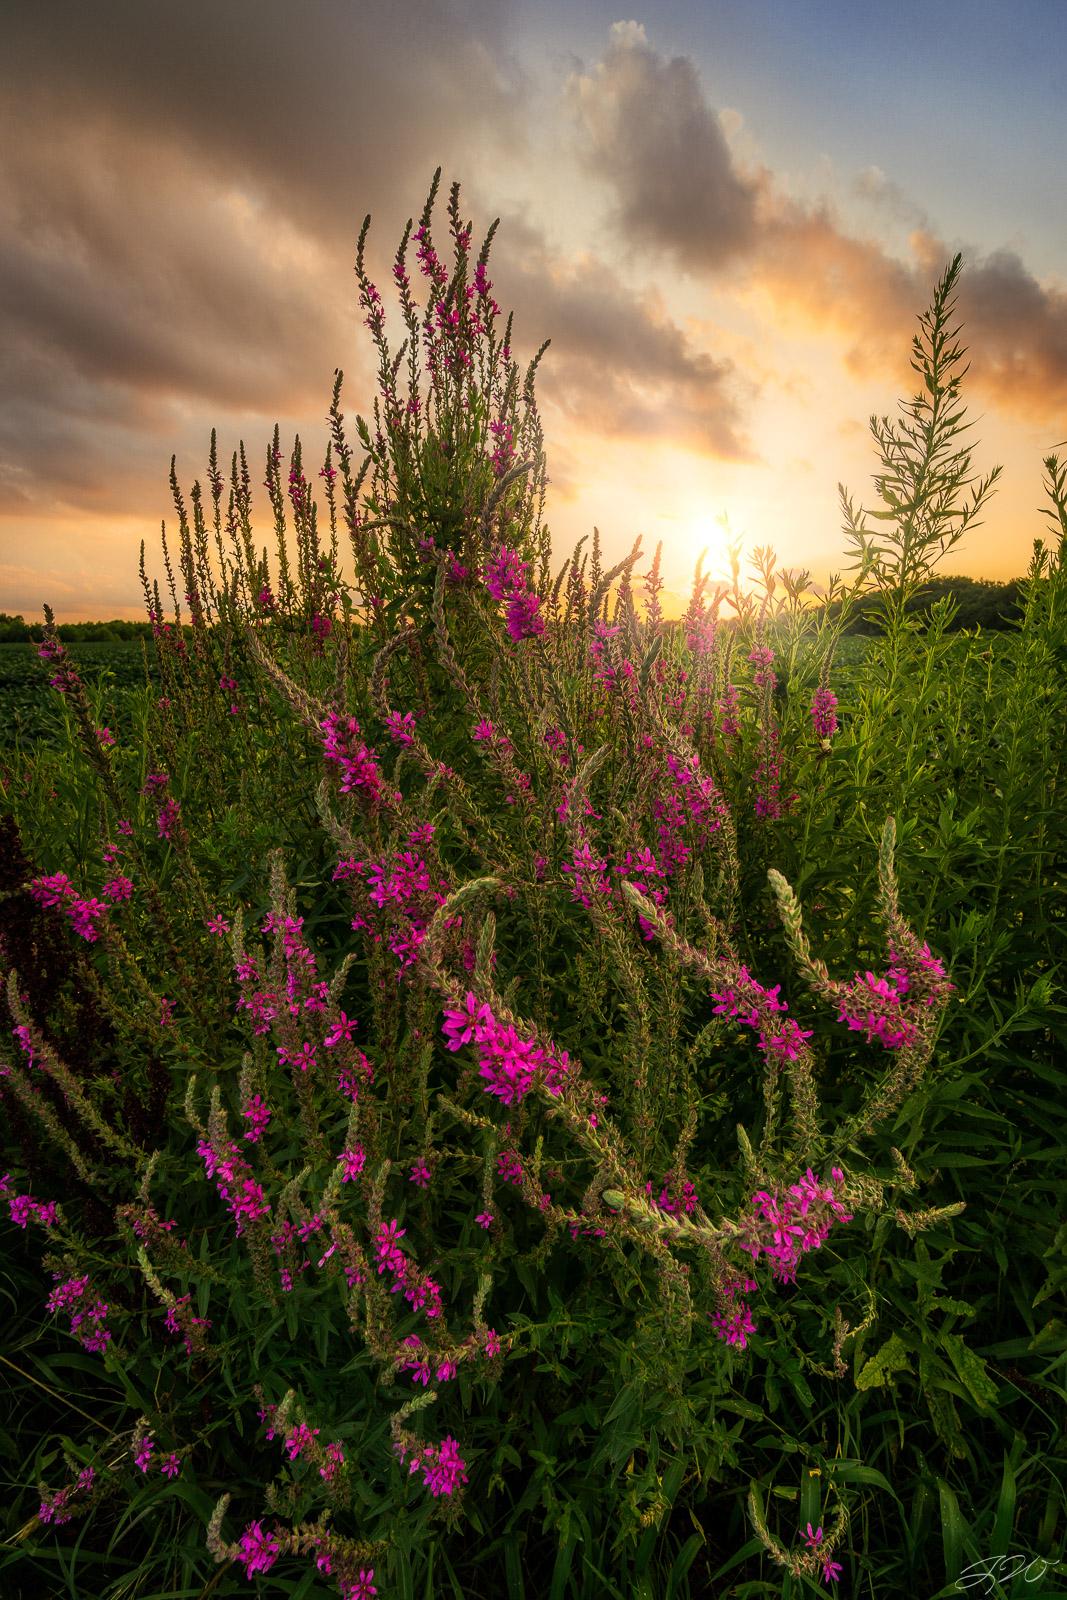 purple loosestrife, sunset, flowers, wildflowers, bloom, summer, photo